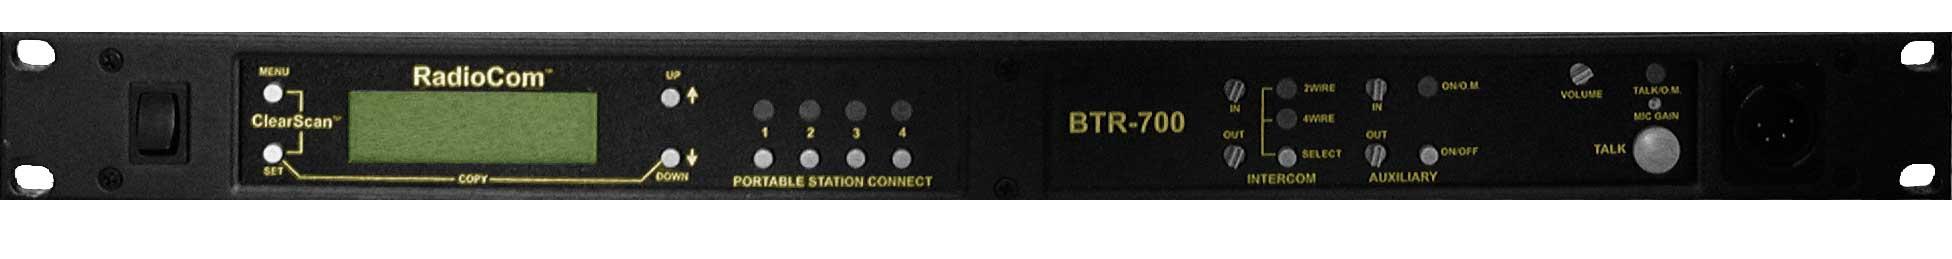 UHF Radiocom Base, 71303R5XX